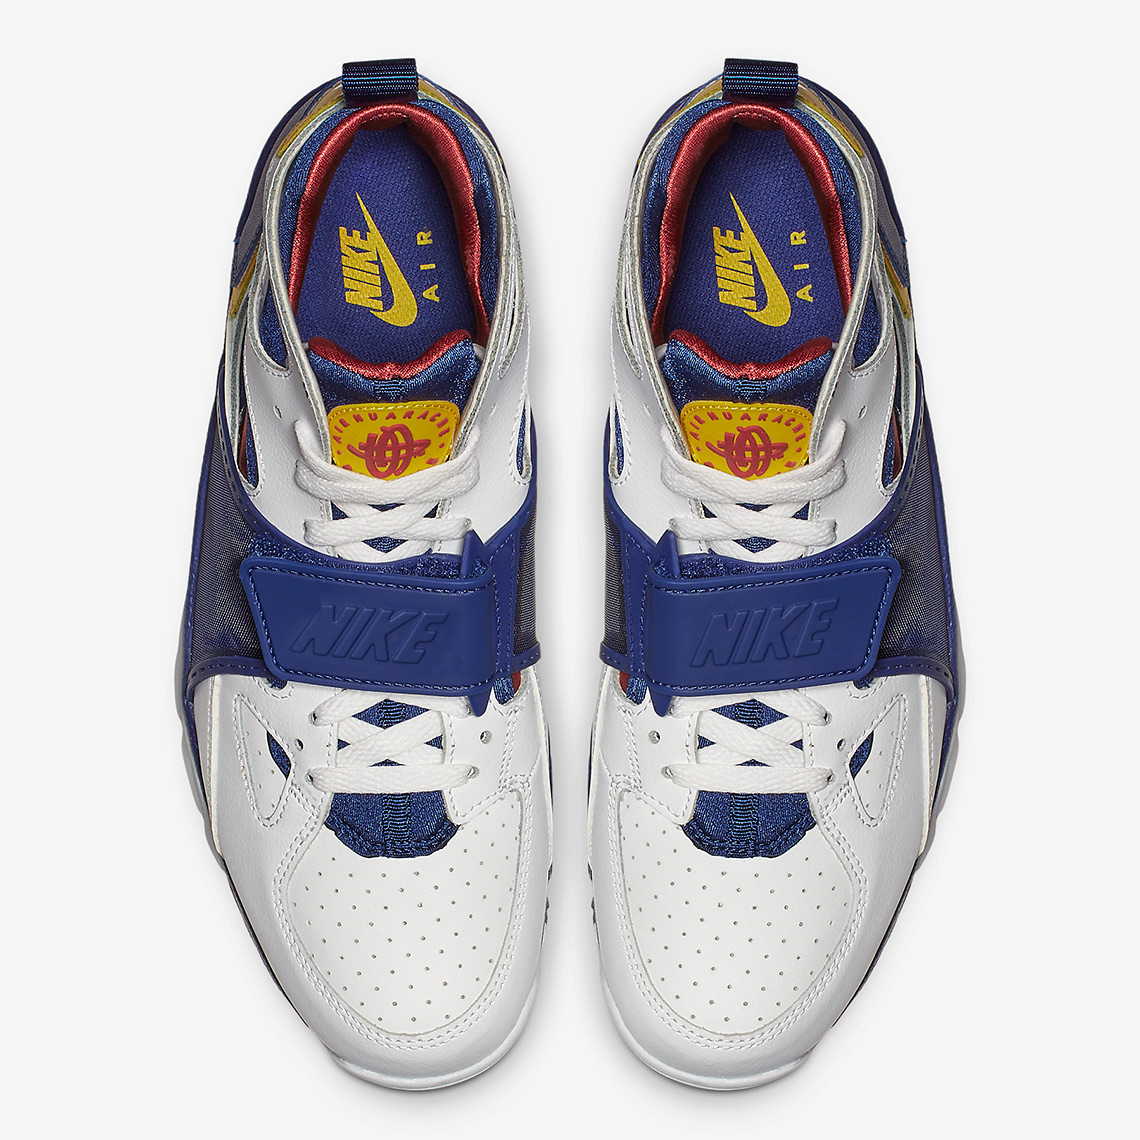 Nike Air Trainer Huarache 679083-107 Release Info | SneakerNews.com